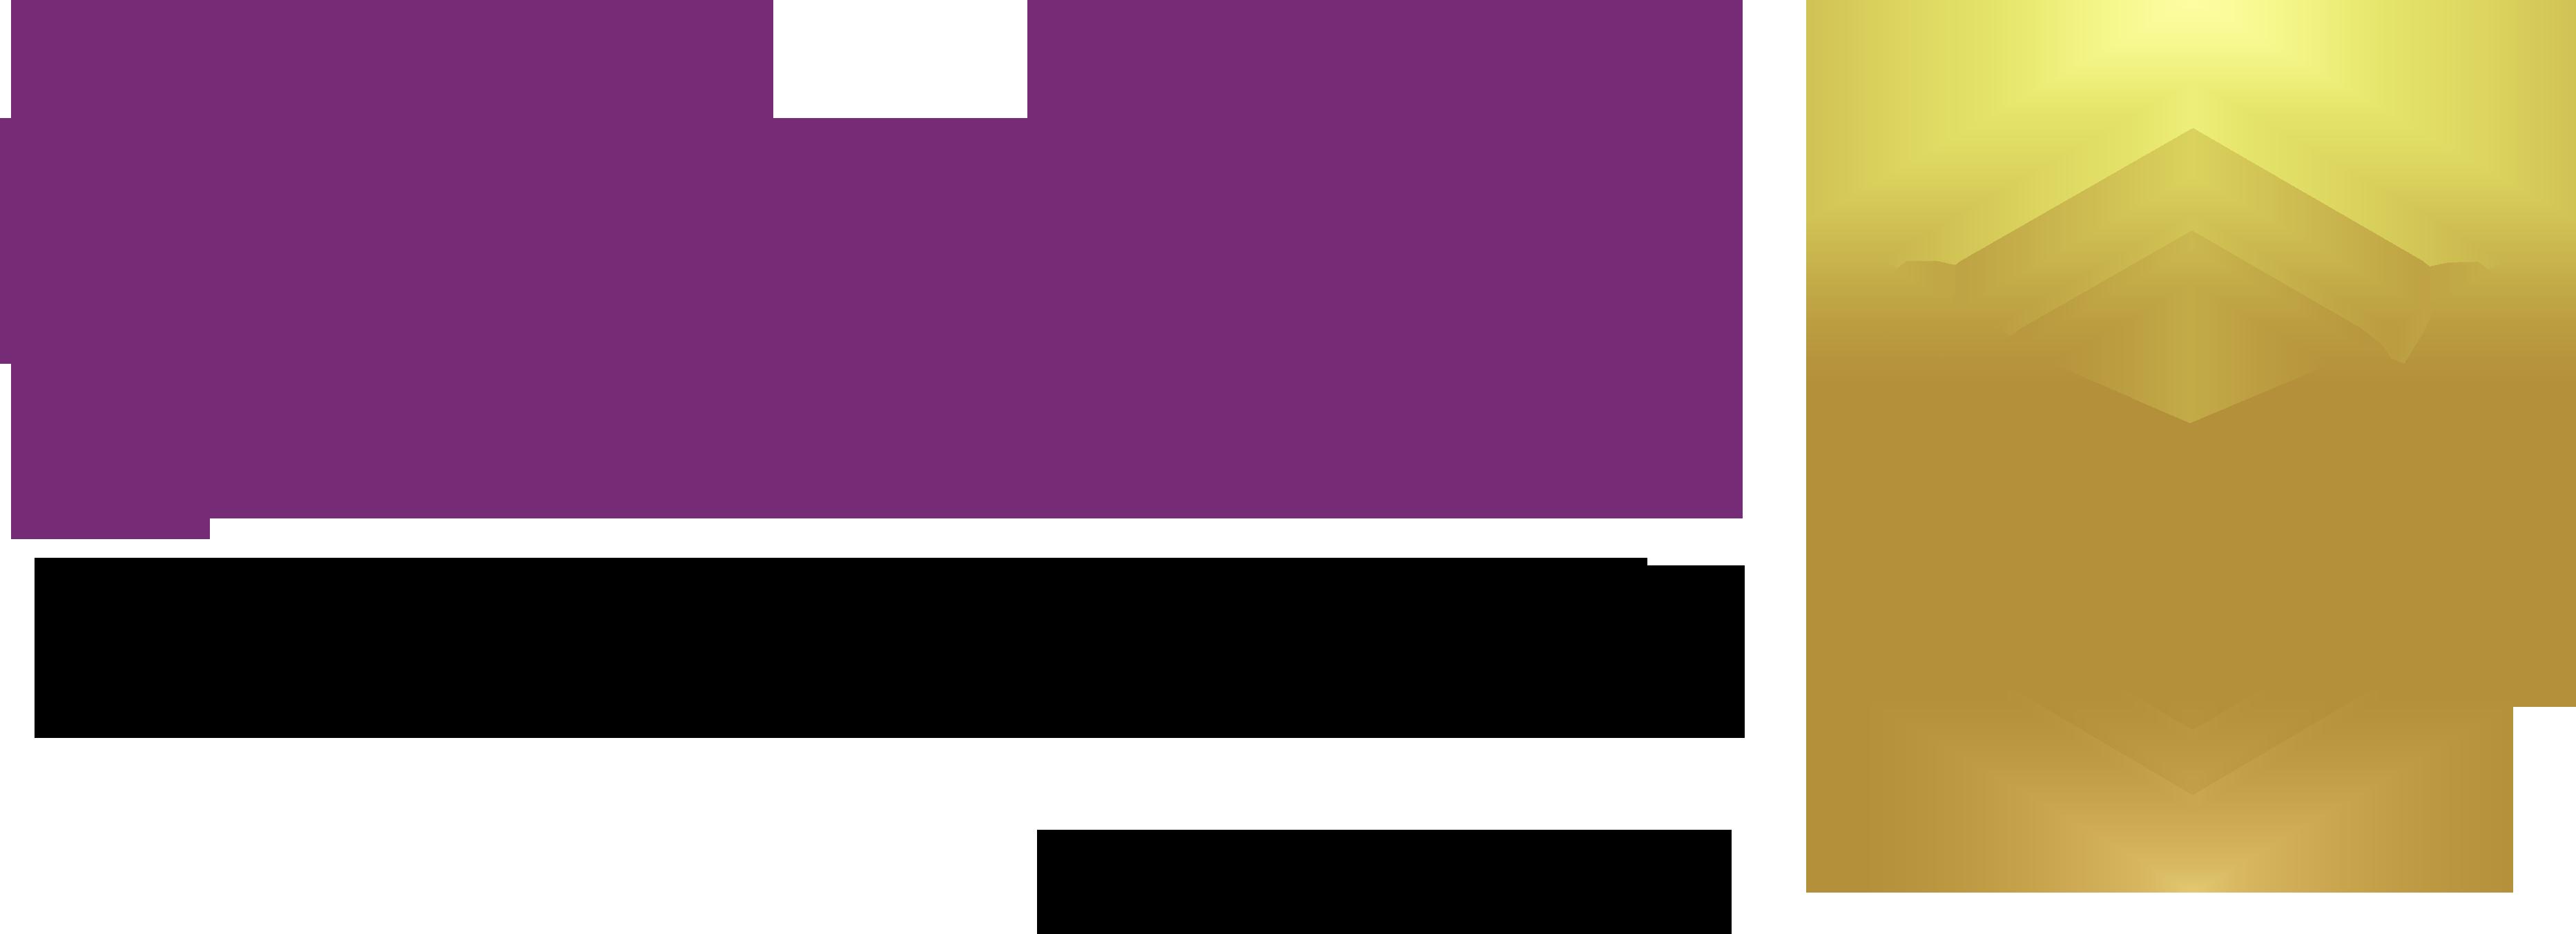 Shariah Compliant Advisory Services & Consultant: Usmani & Co. Pvt. Ltd.